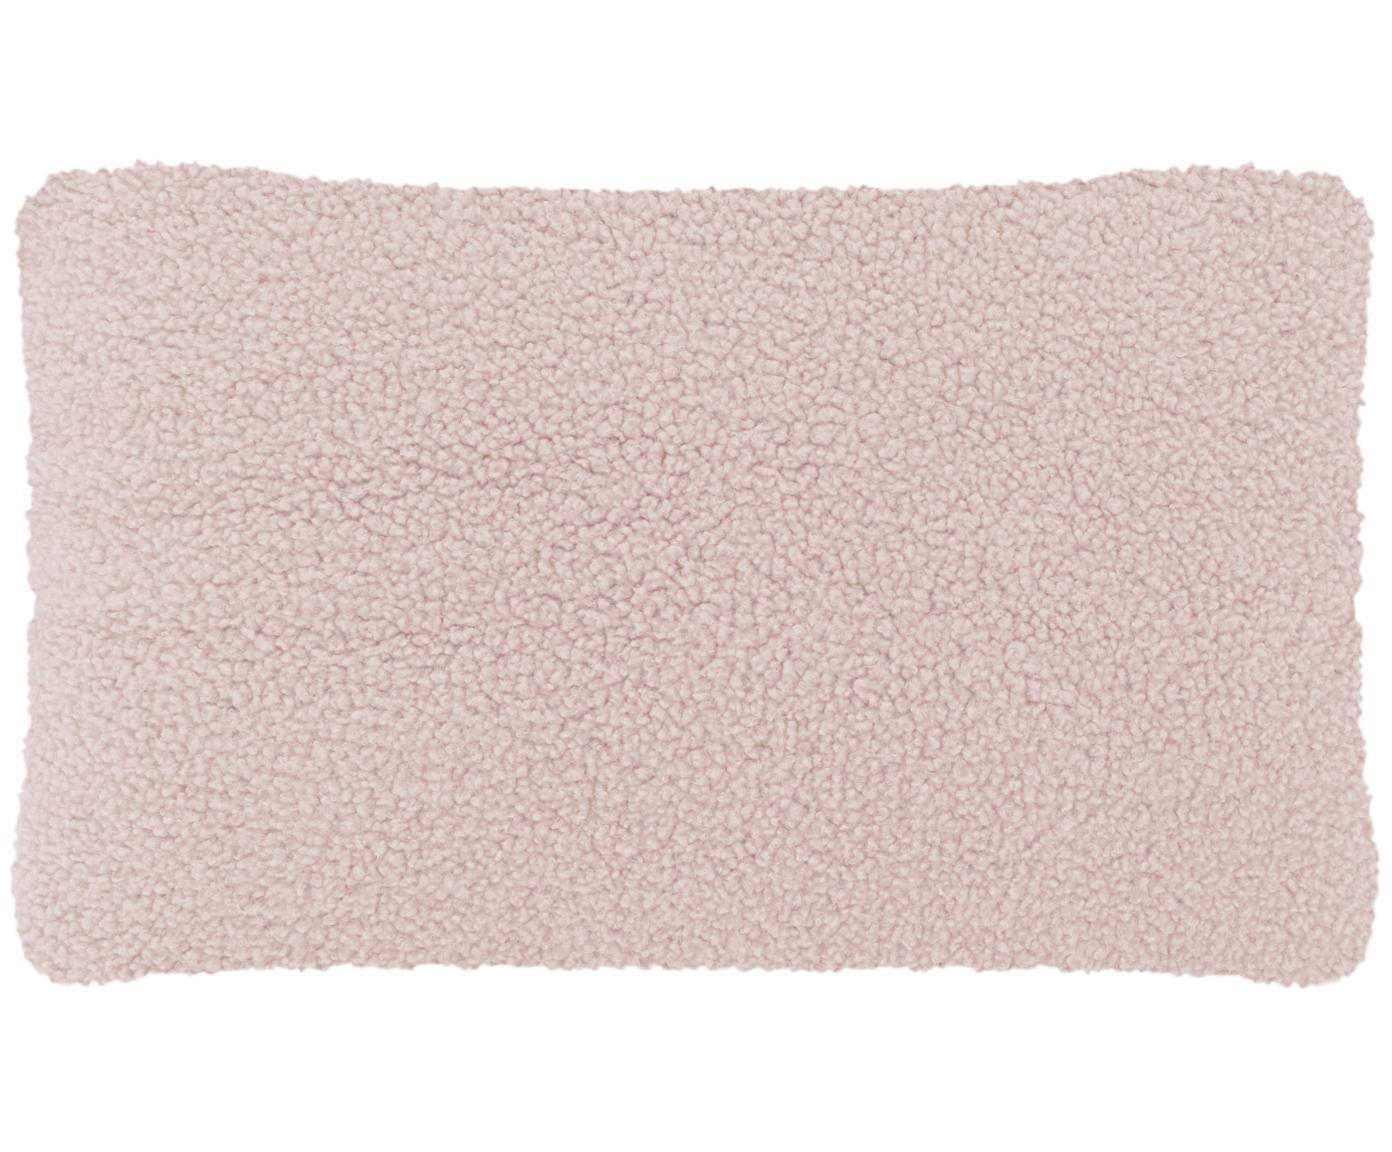 Funda de cojín de borreguillo Mille, Funda: poliéster (borreguillo), Rosa, An 30 x L 50 cm